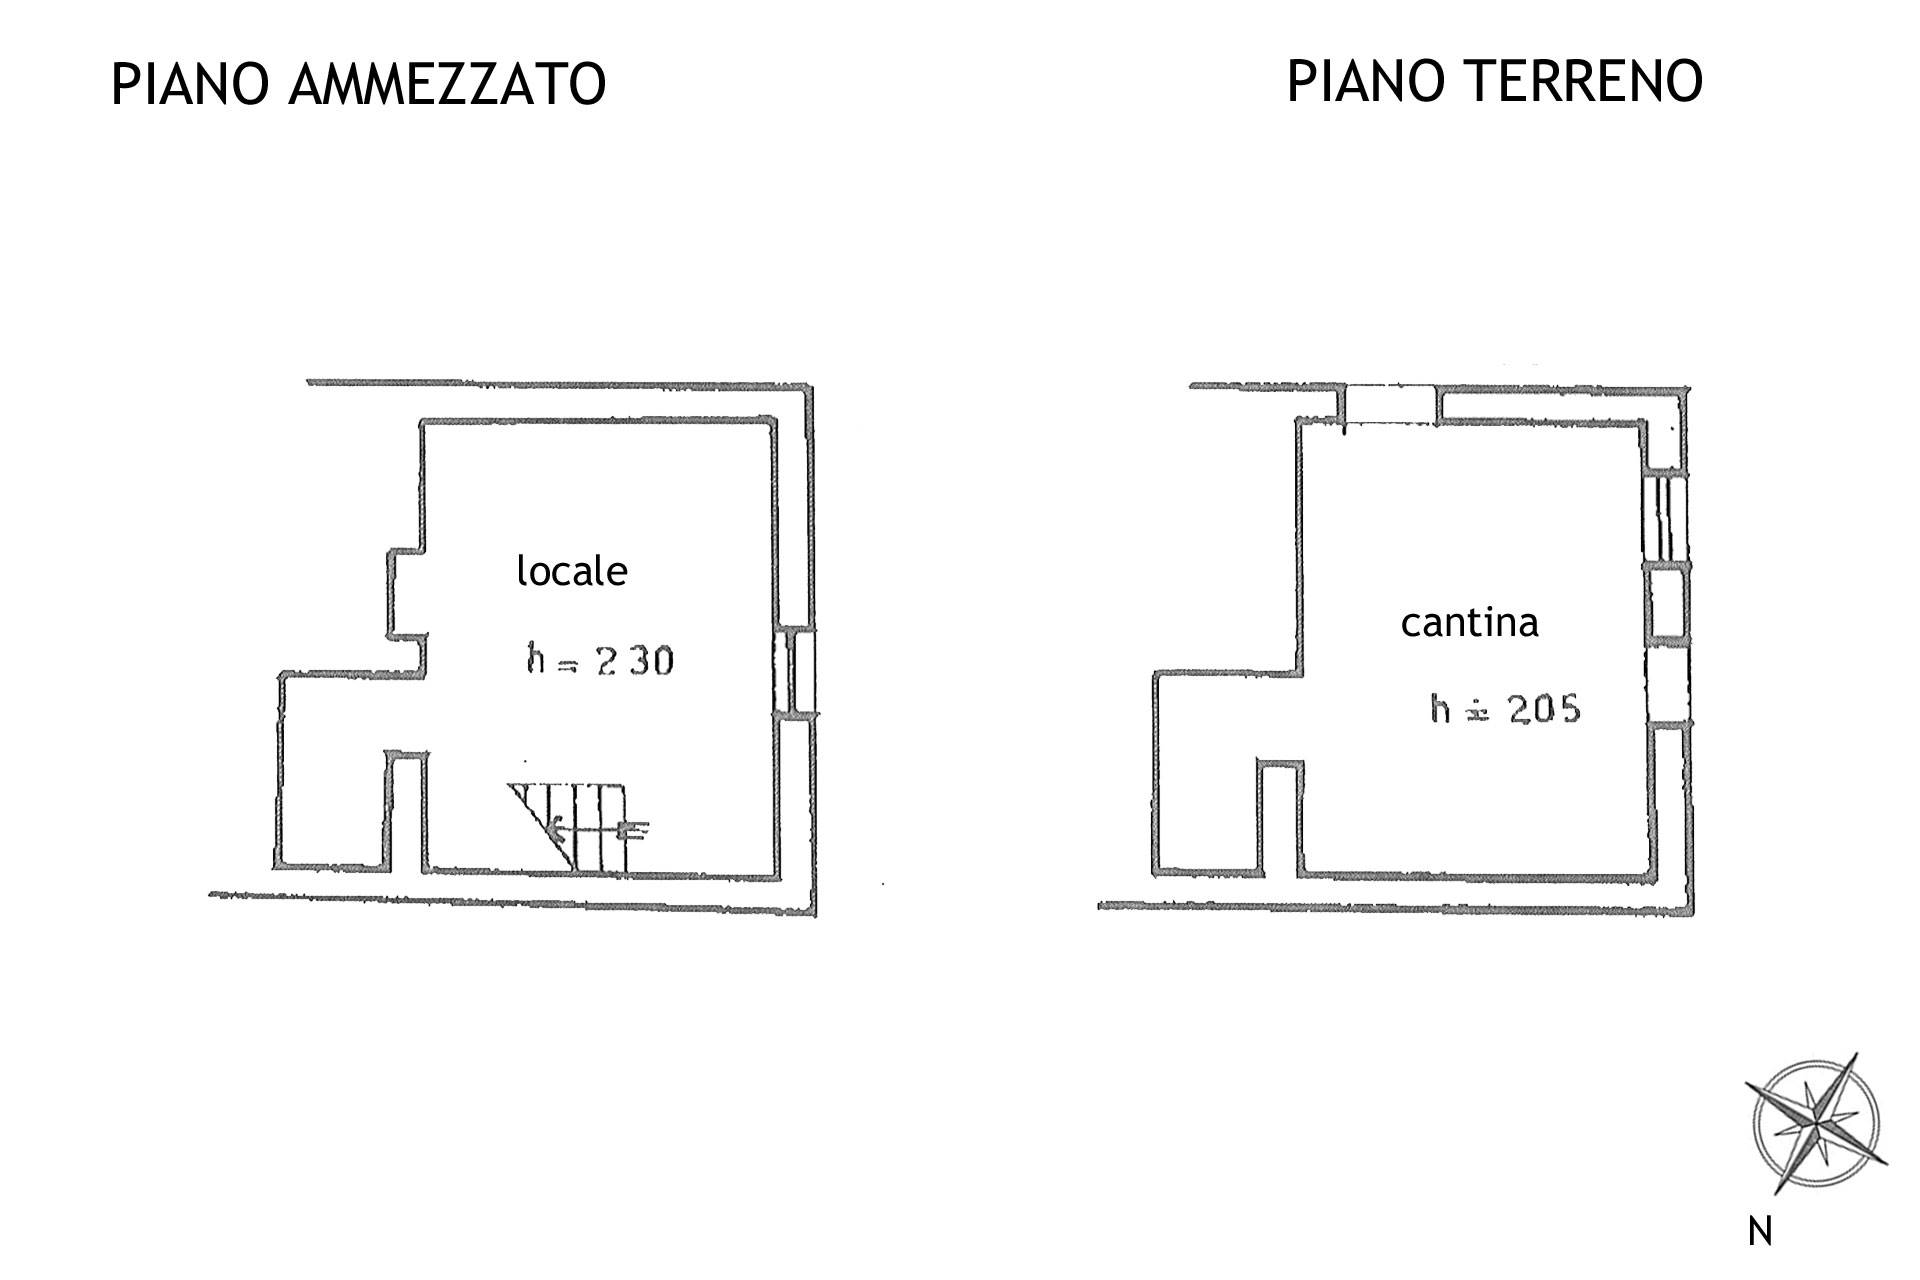 R23-planimetria locale e cantina